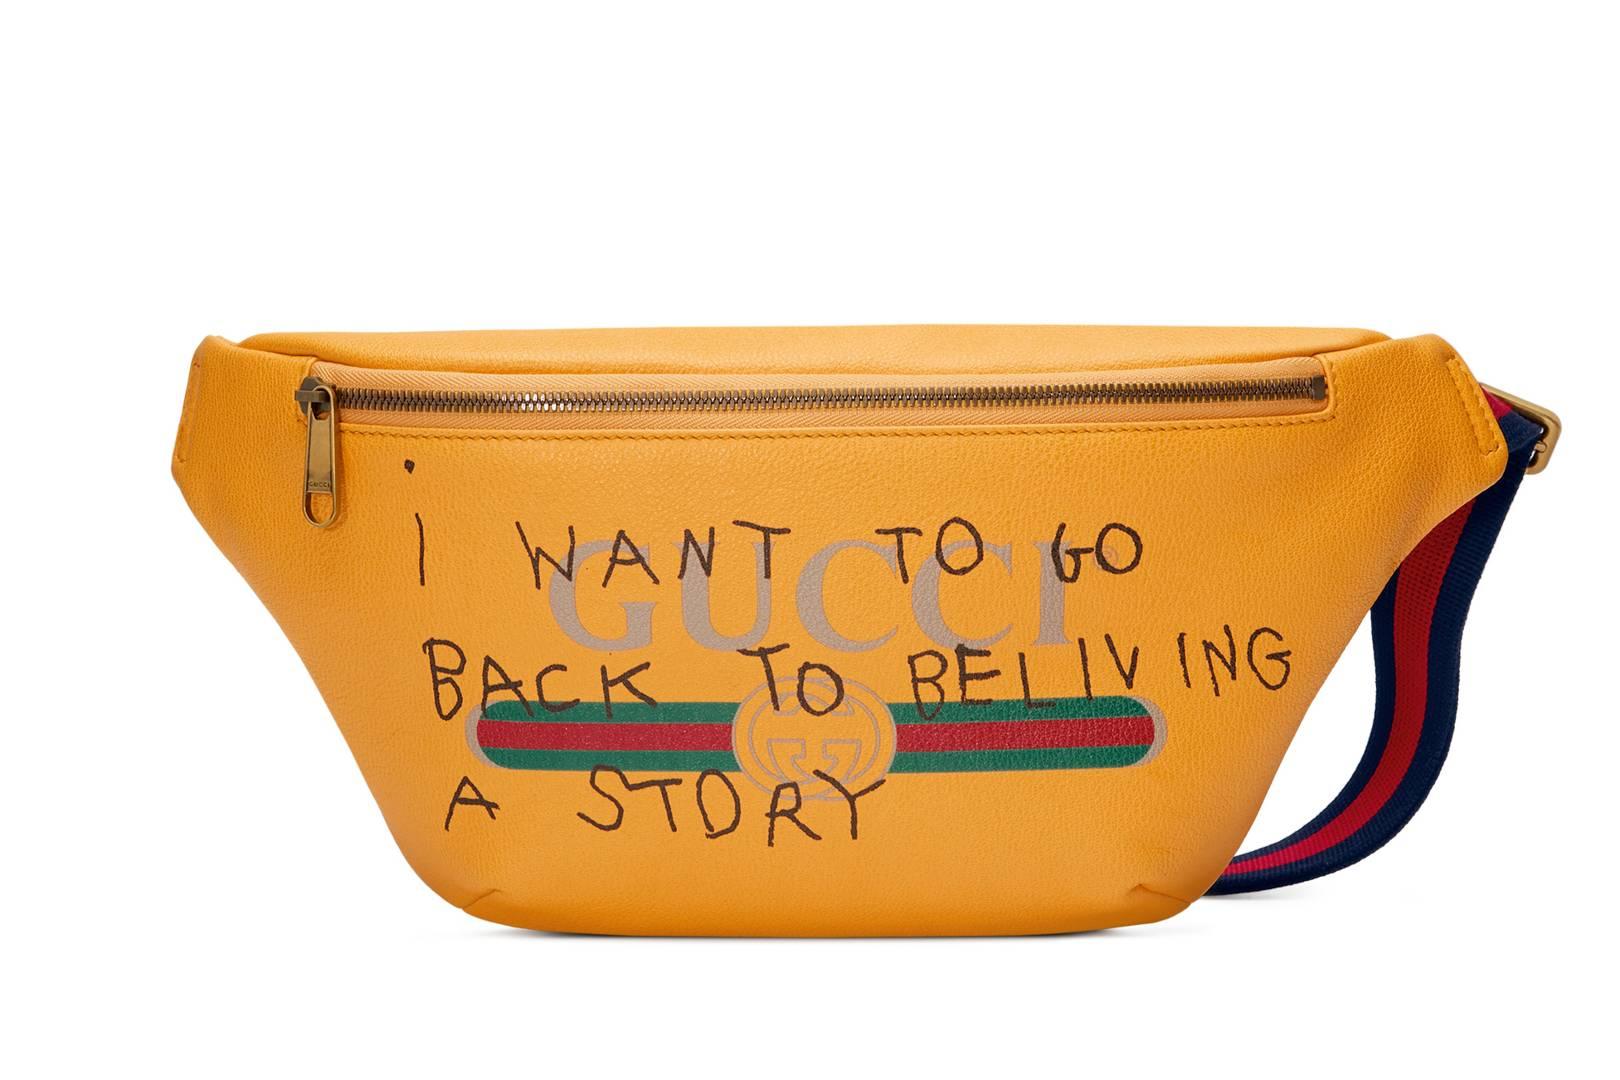 10a84e485 Handbag History: 13 Art and Fashion Collaborations You Must Know | British  Vogue